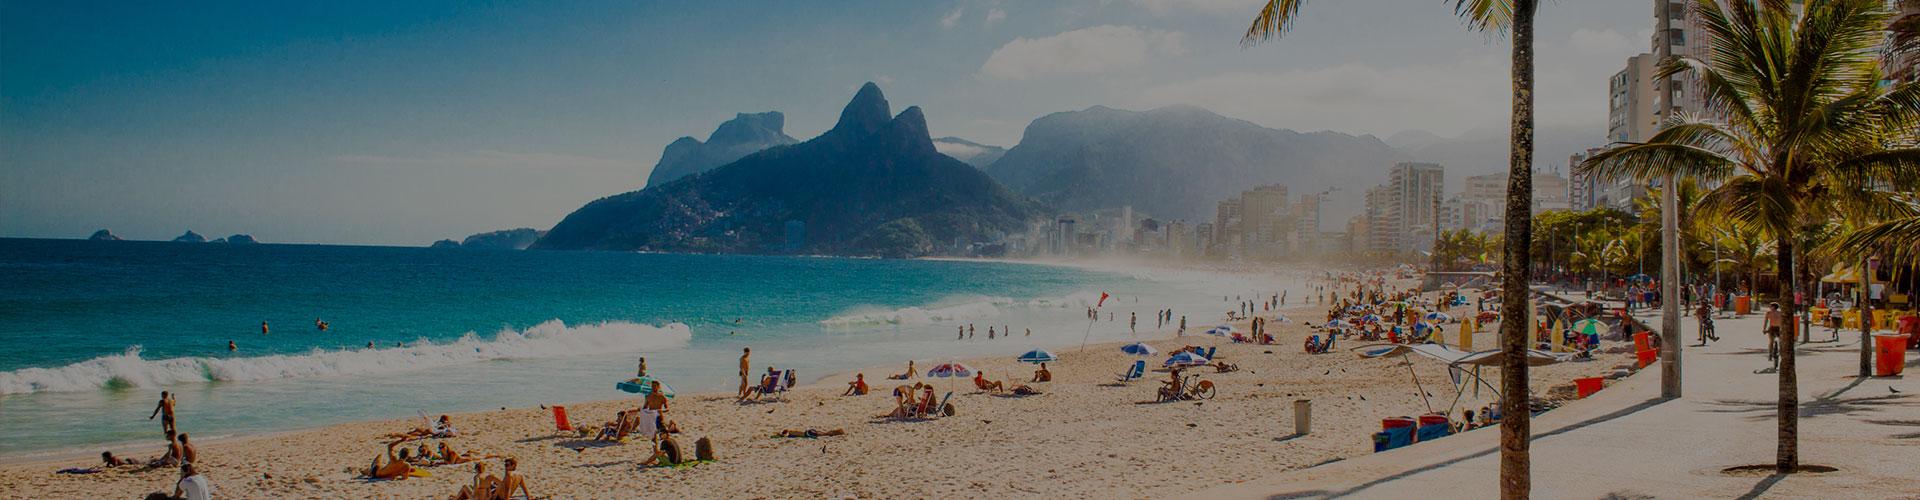 Landmark photograph of Brazil